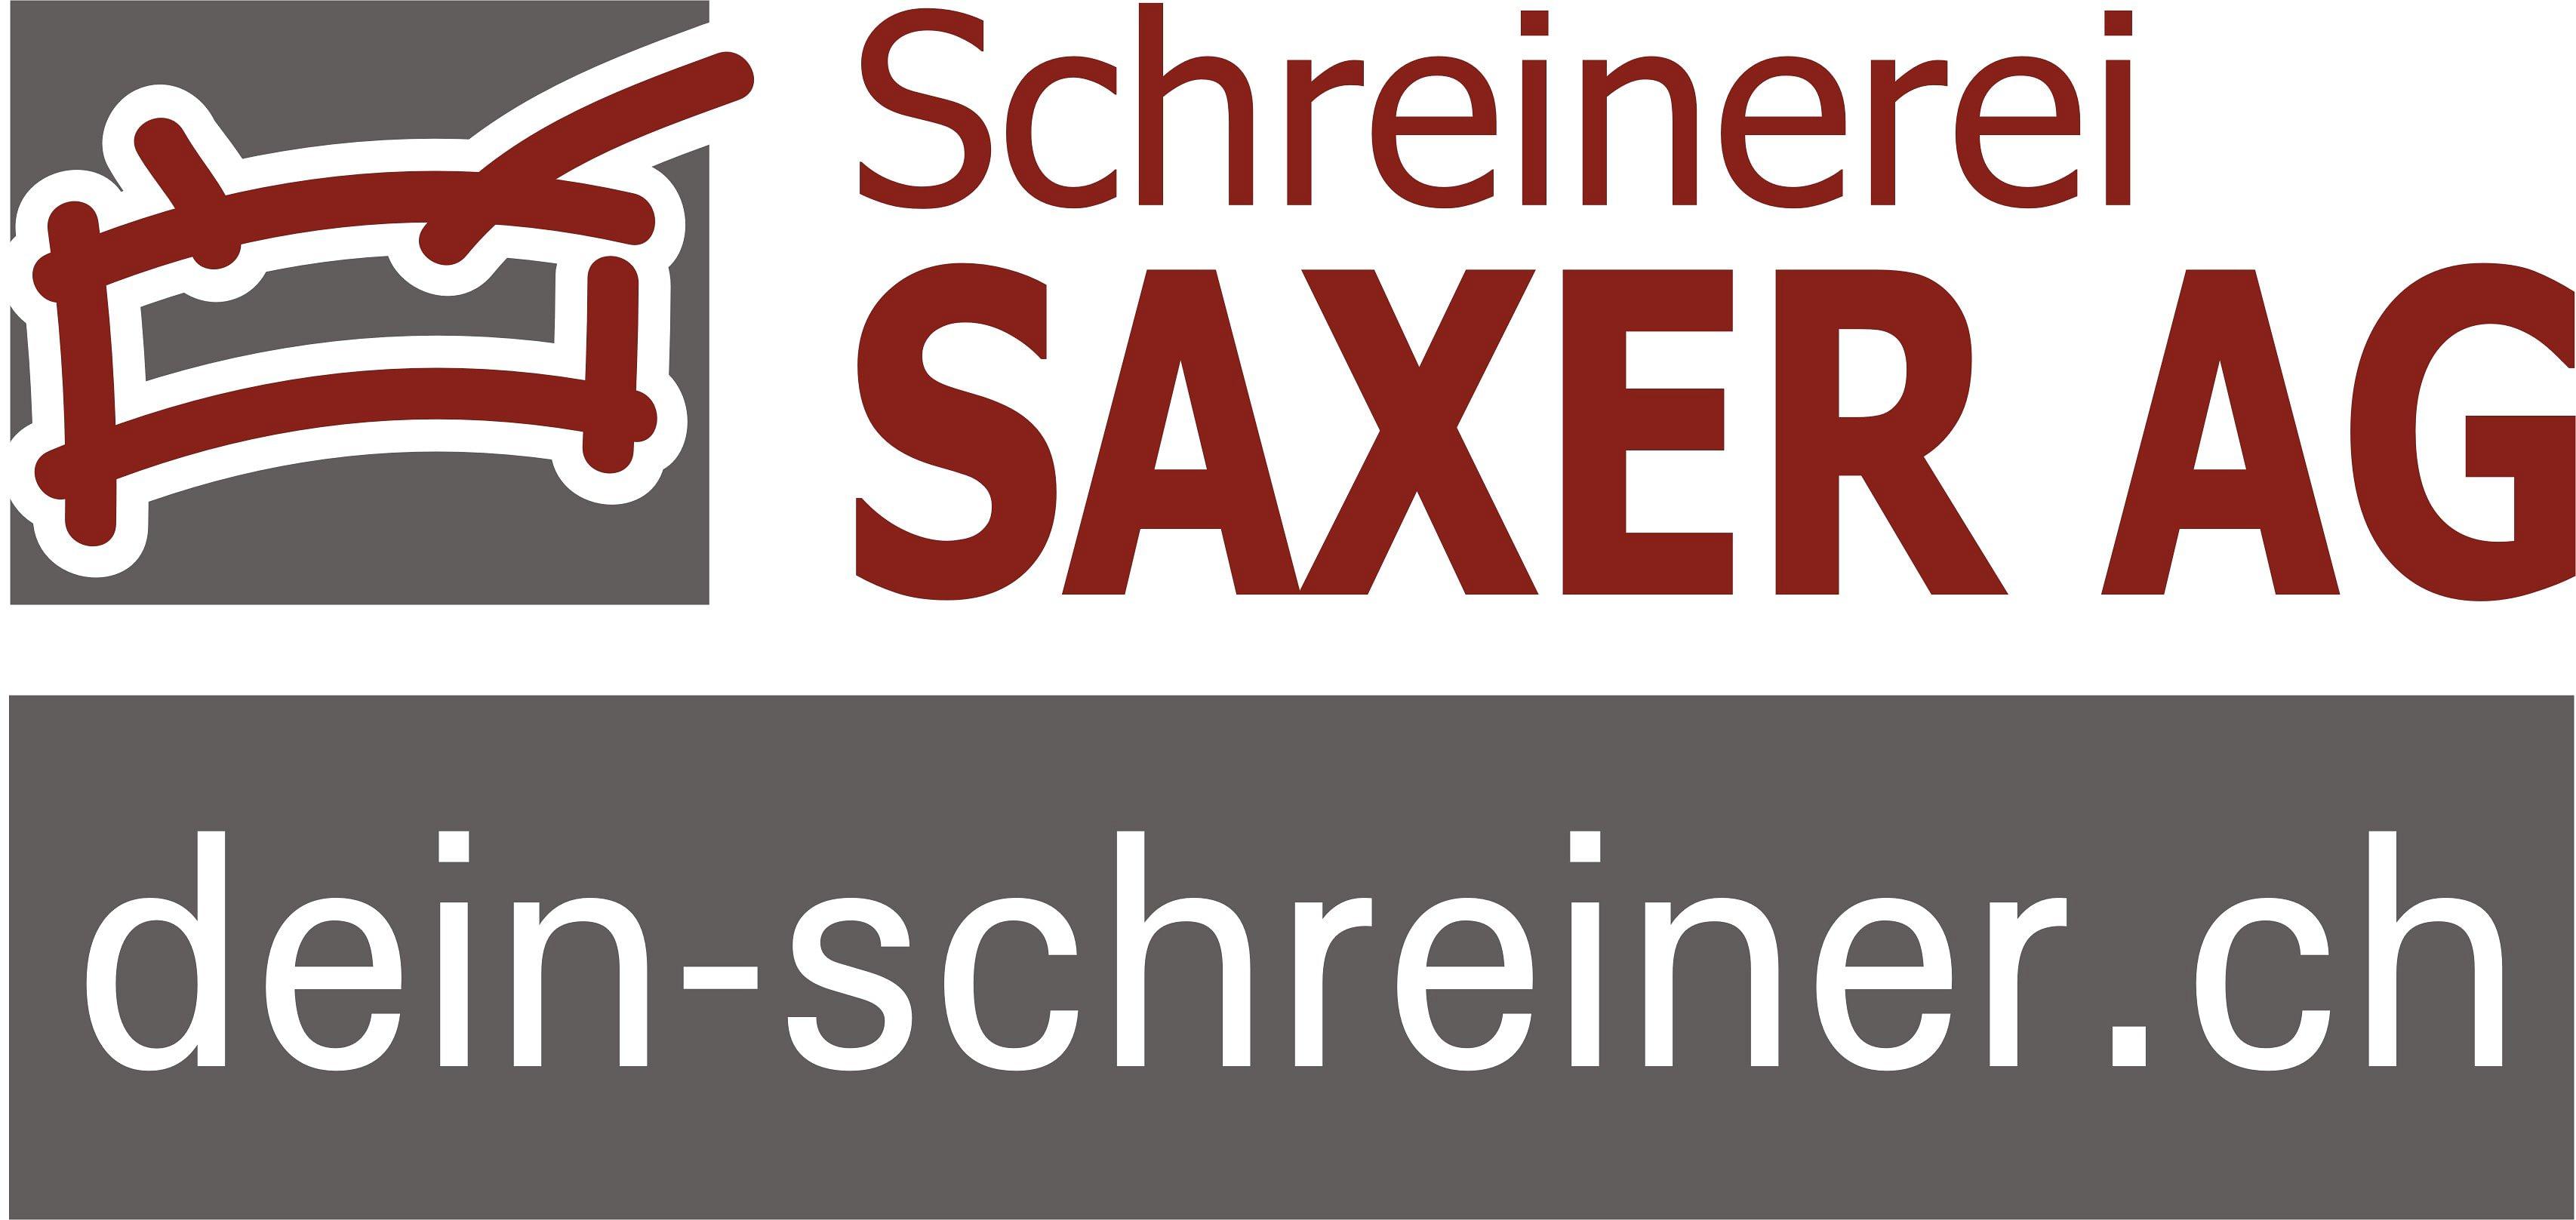 Schreinerei Saxer AG